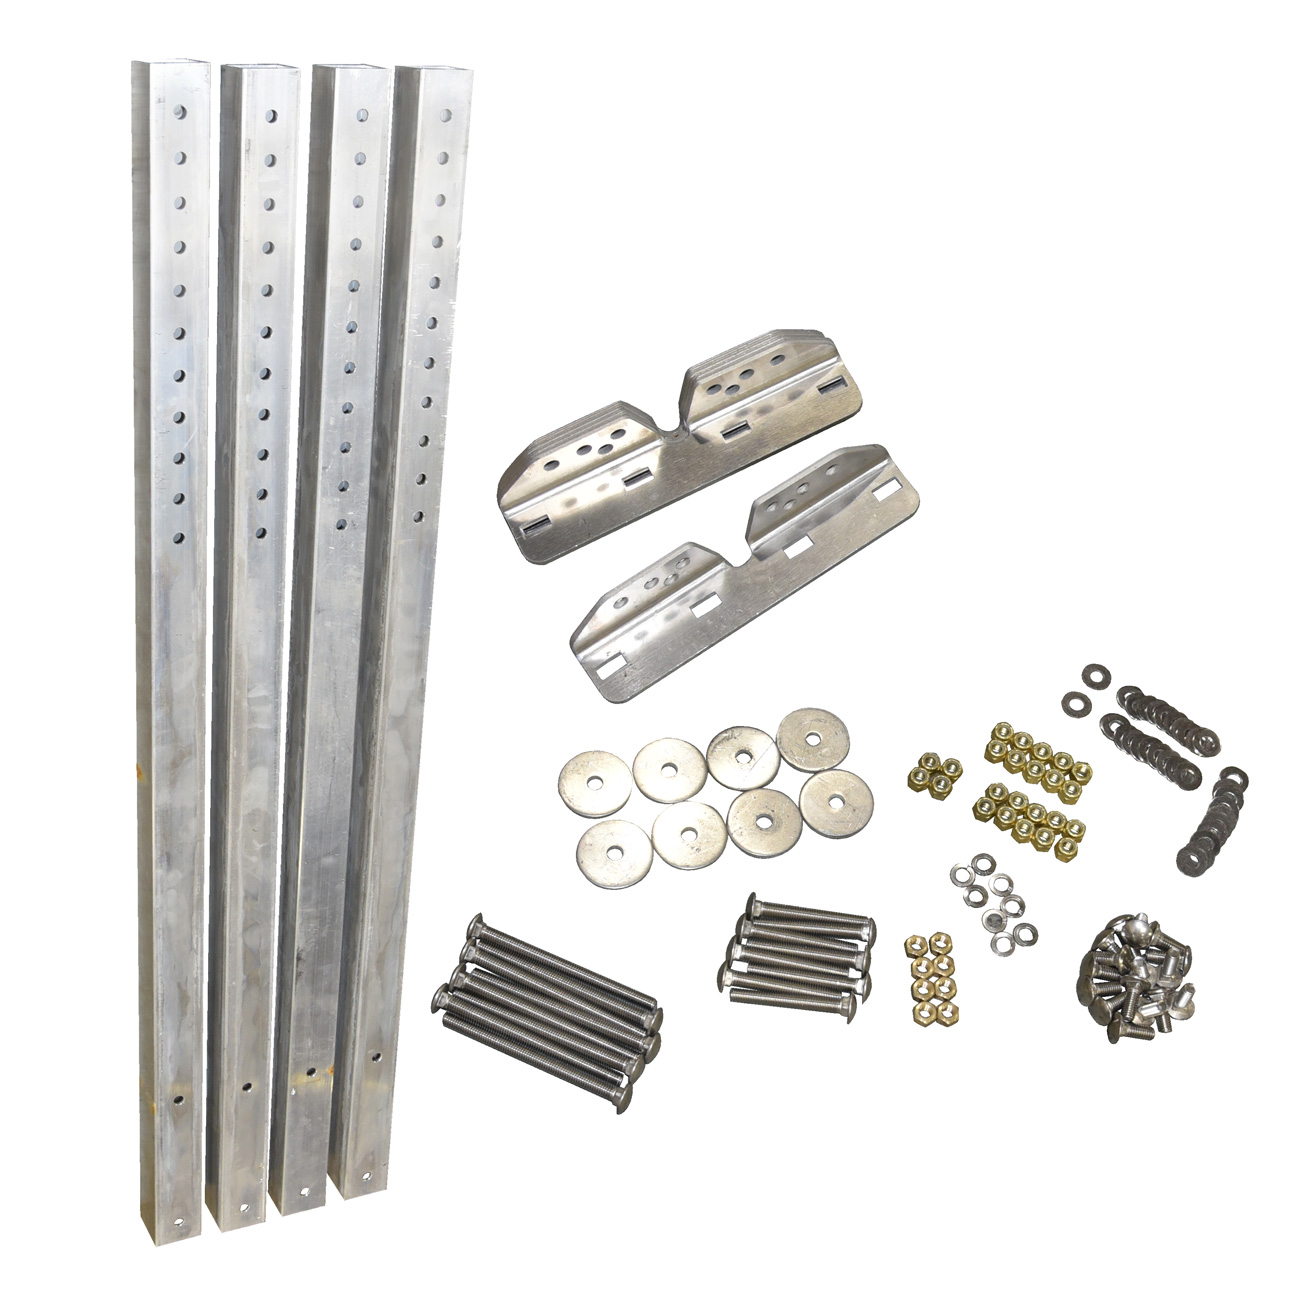 3025-072 ref HA0096 Pontoon Kit for Aluminum Frames Shorestation Lifts